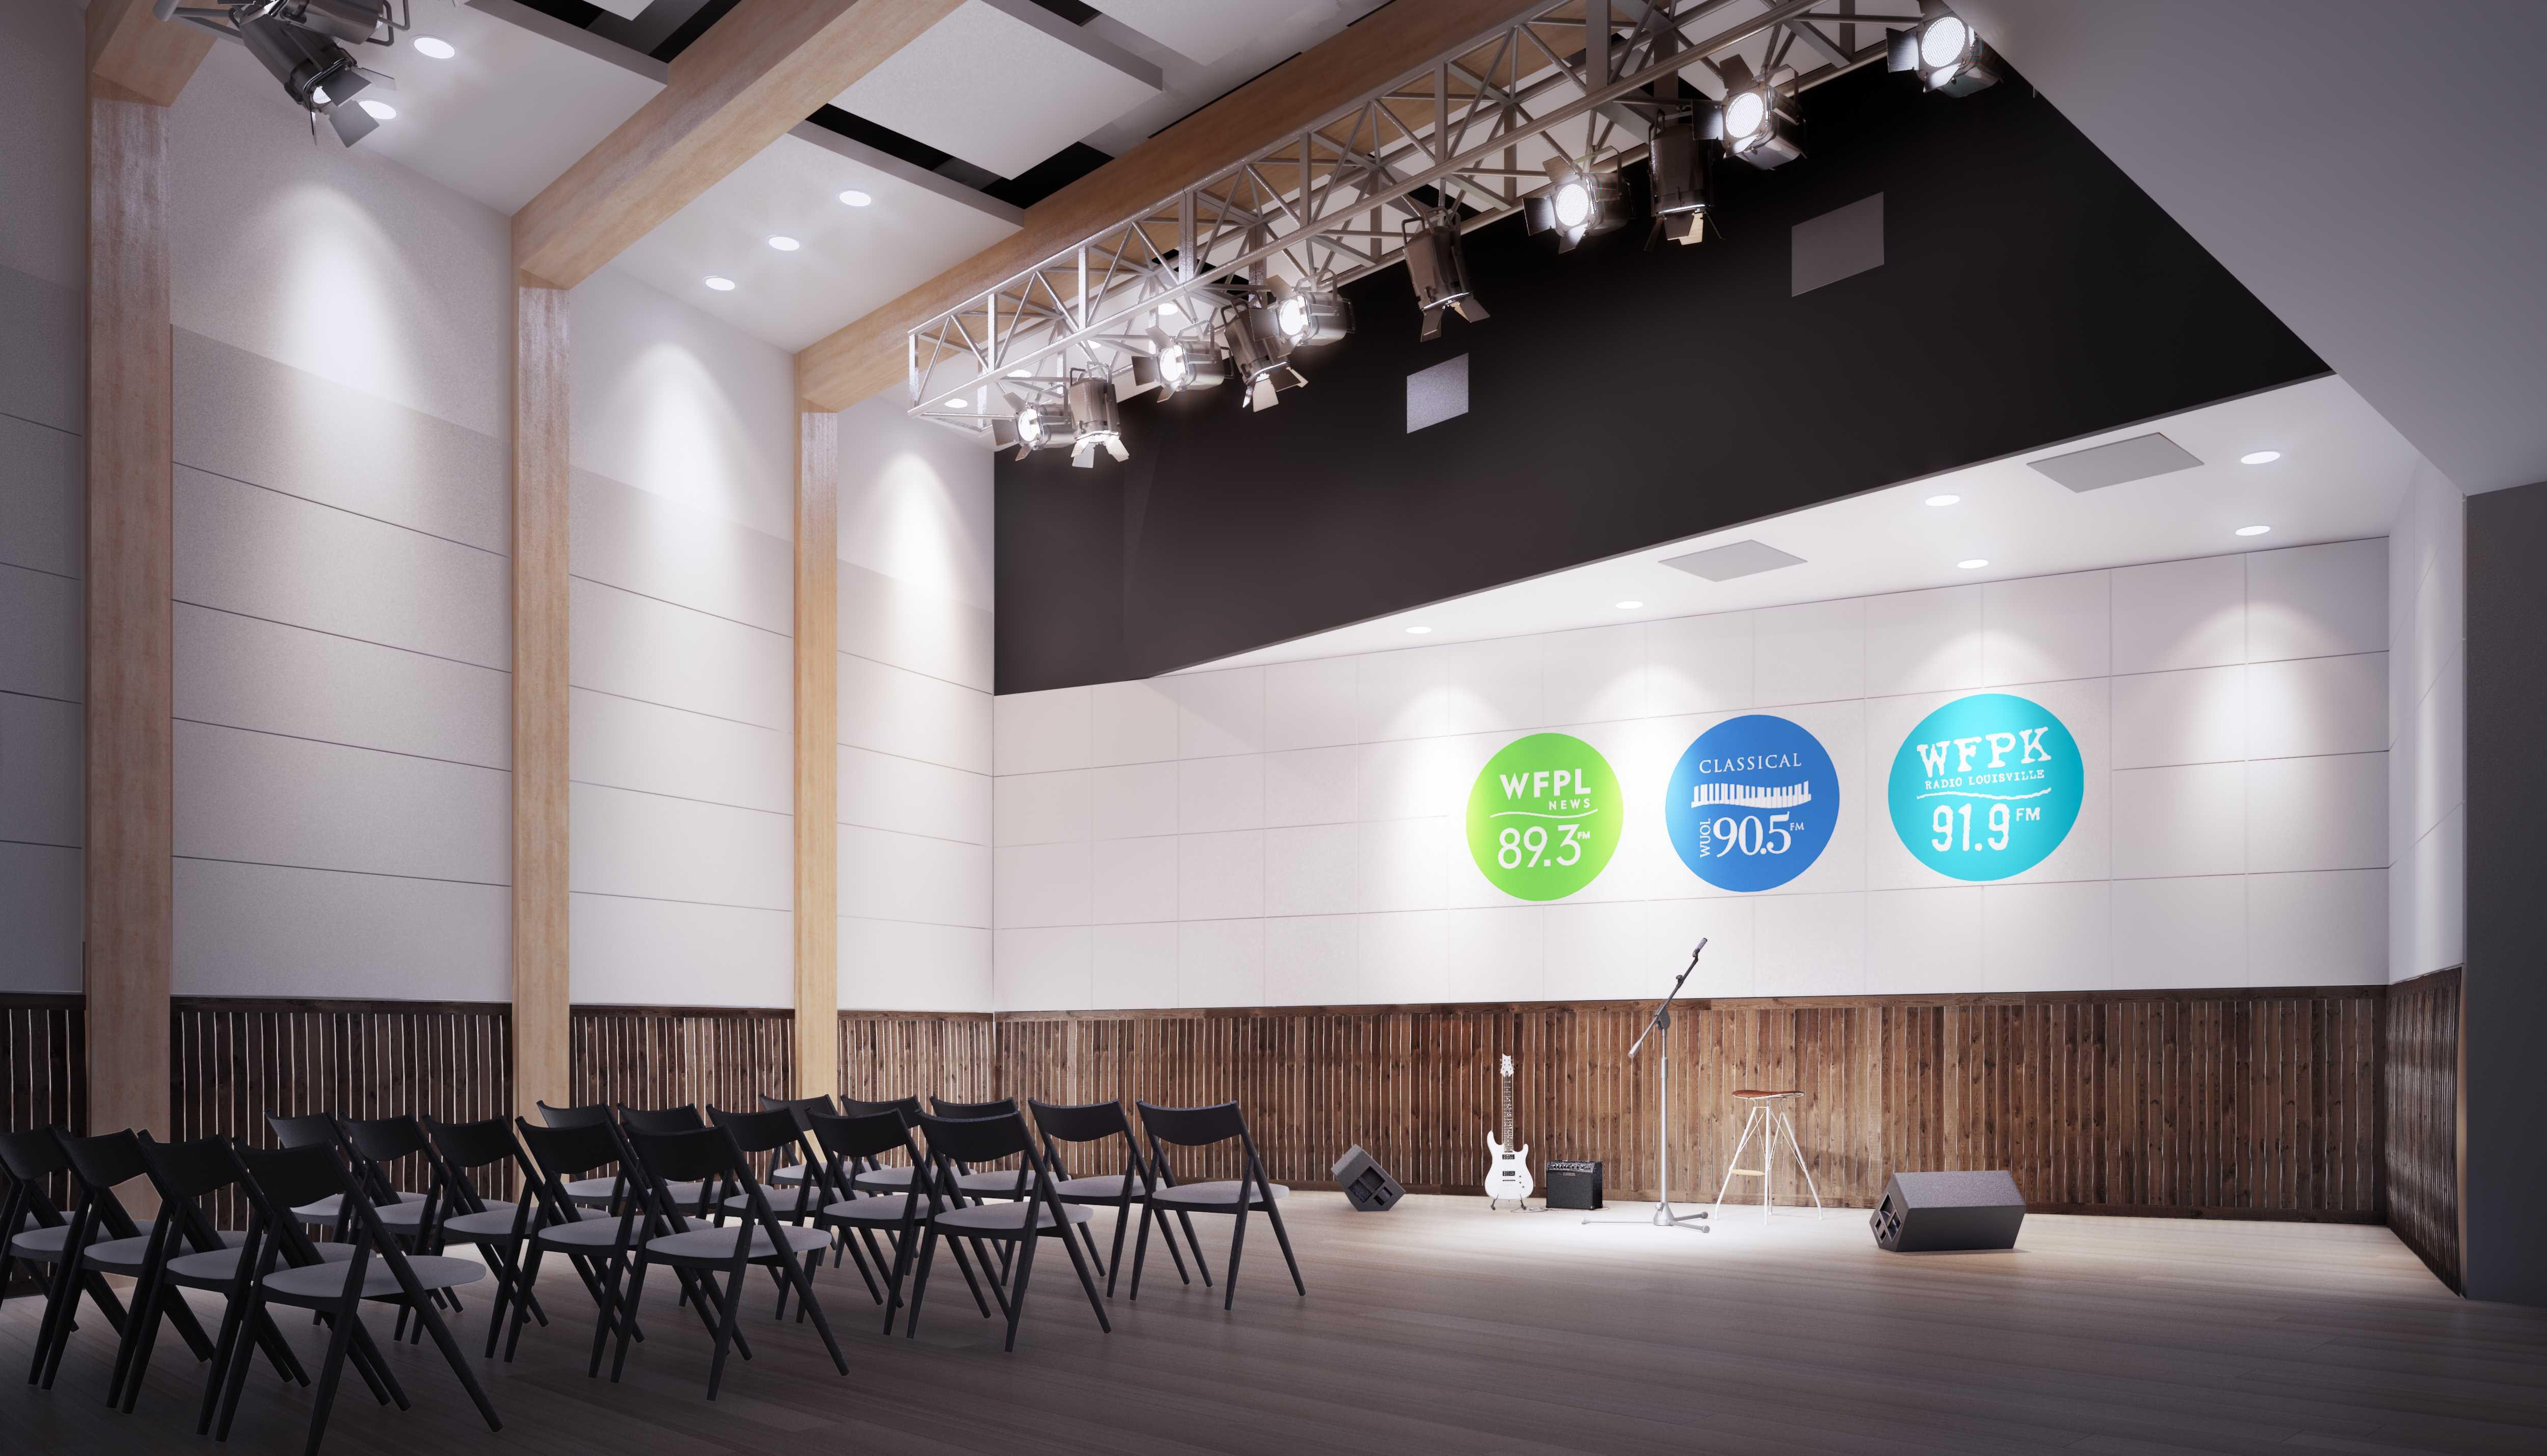 louisville-public-media-performance-hall